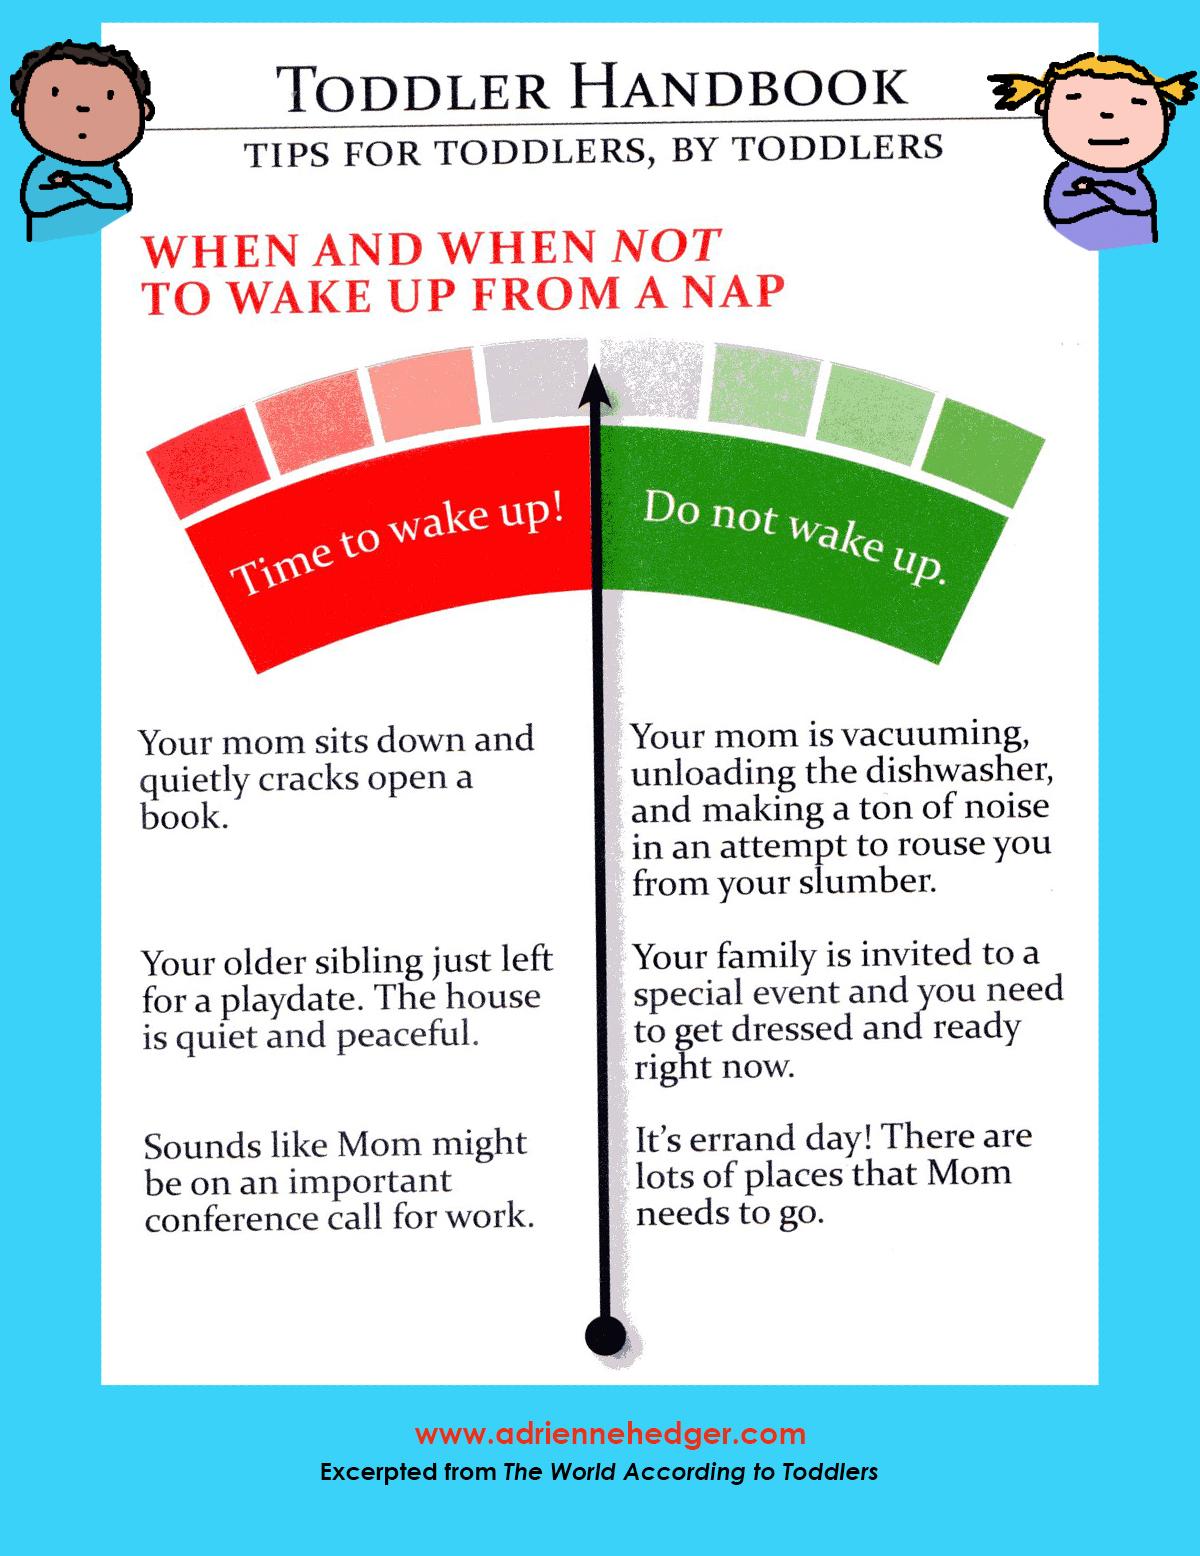 Toddler Handbook - Wake Up From Nap